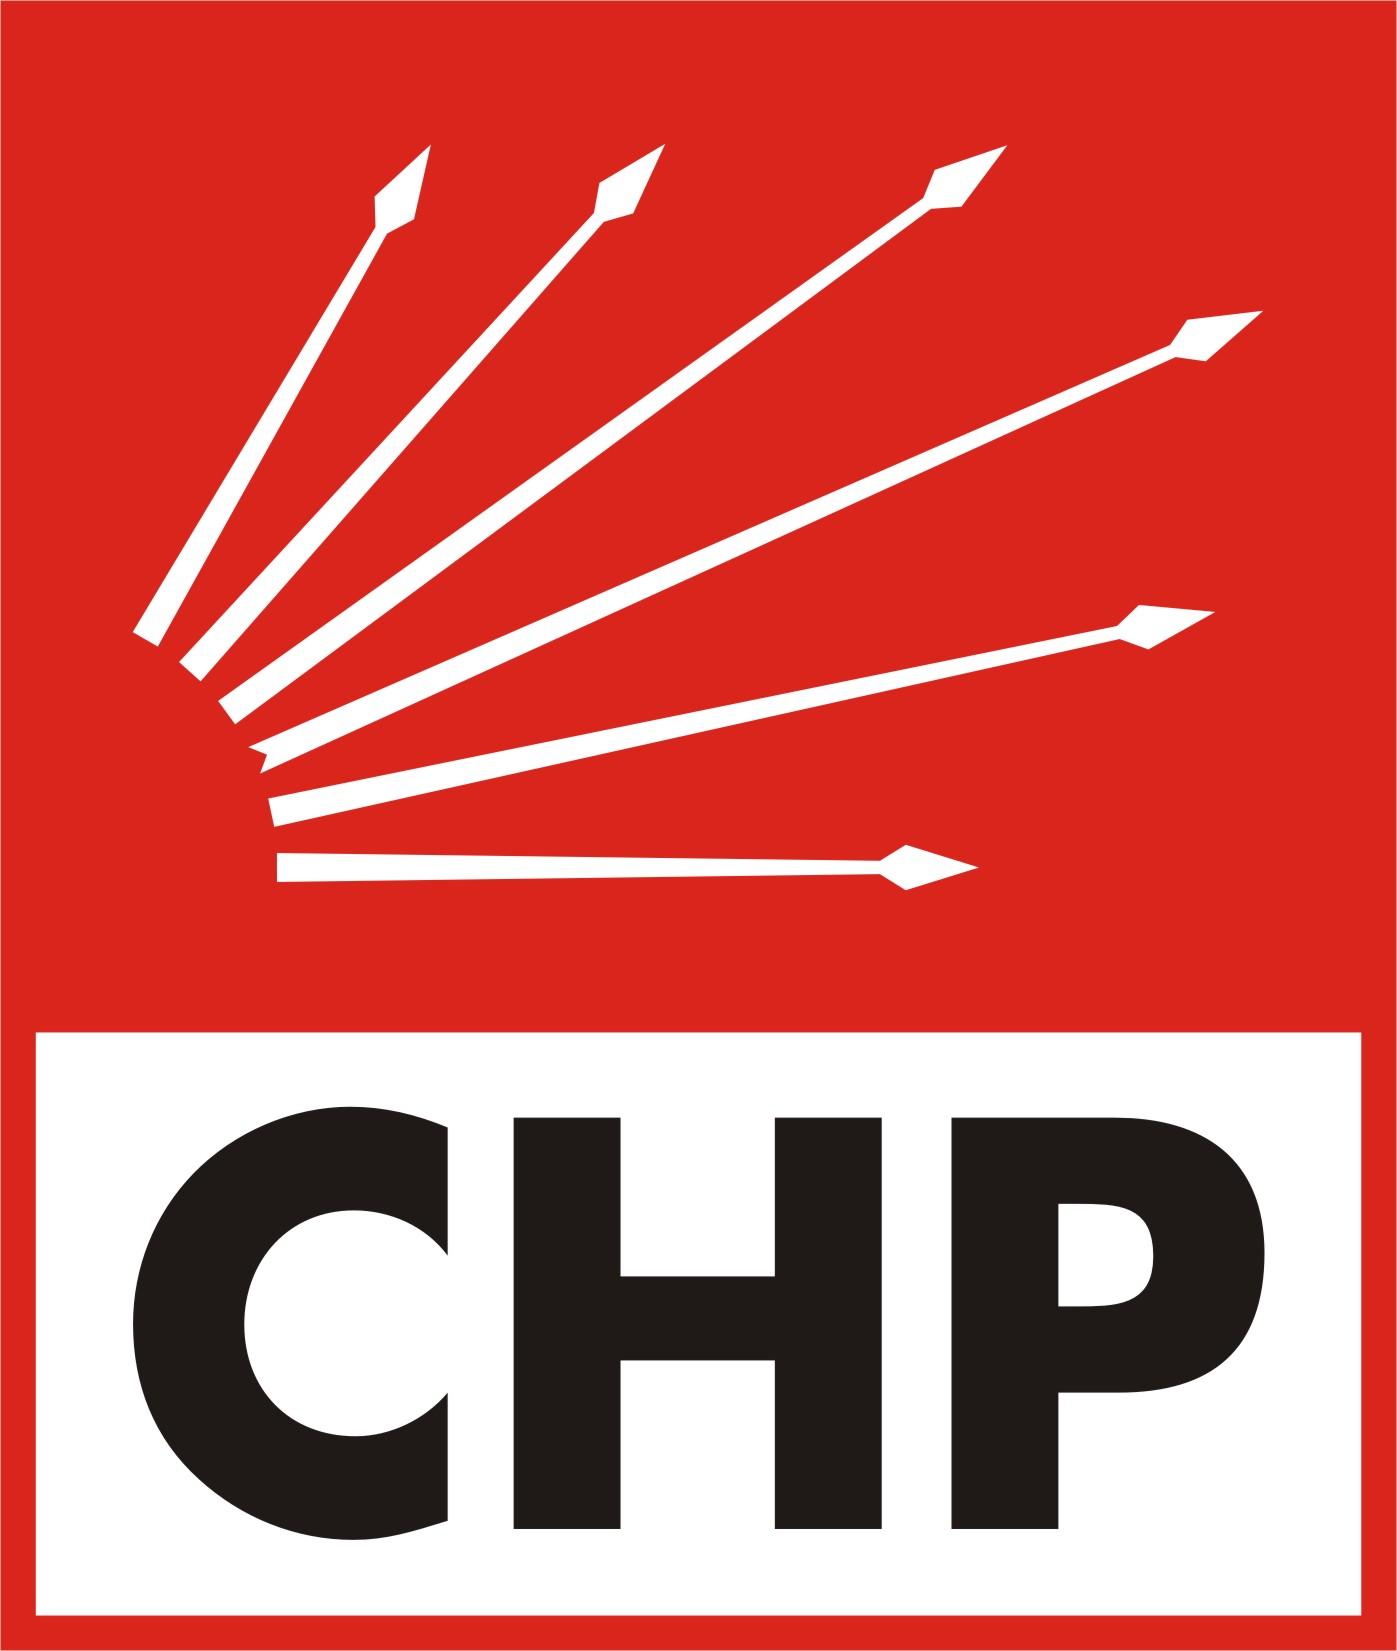 Genel seçimlerde Chp Birinci